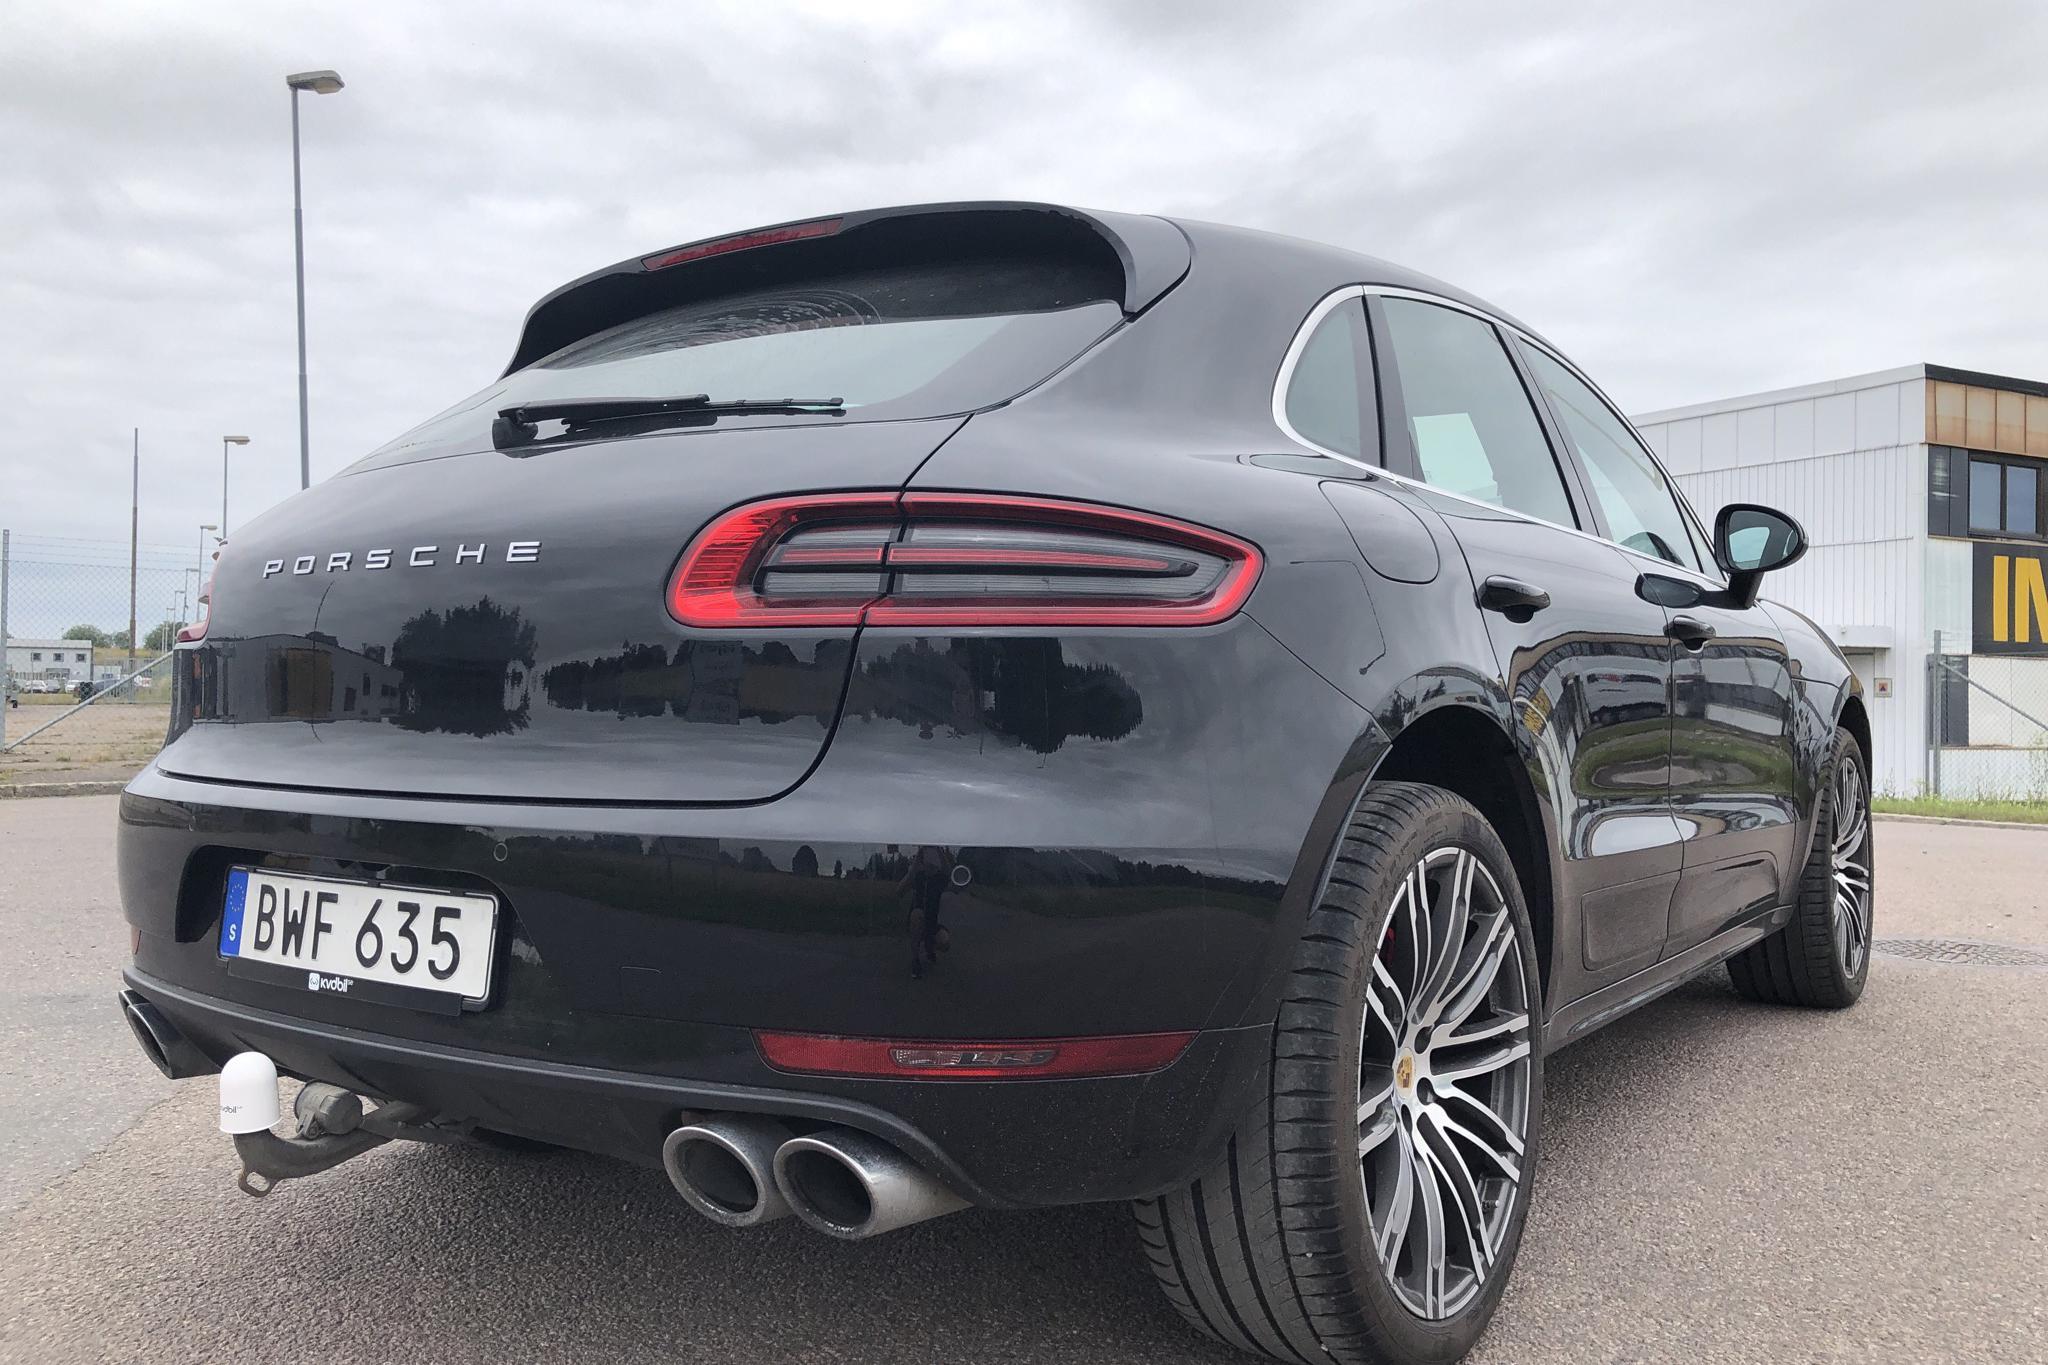 Porsche Macan 3.6 Turbo (400hk) - 9 809 mil - Automat - svart - 2017